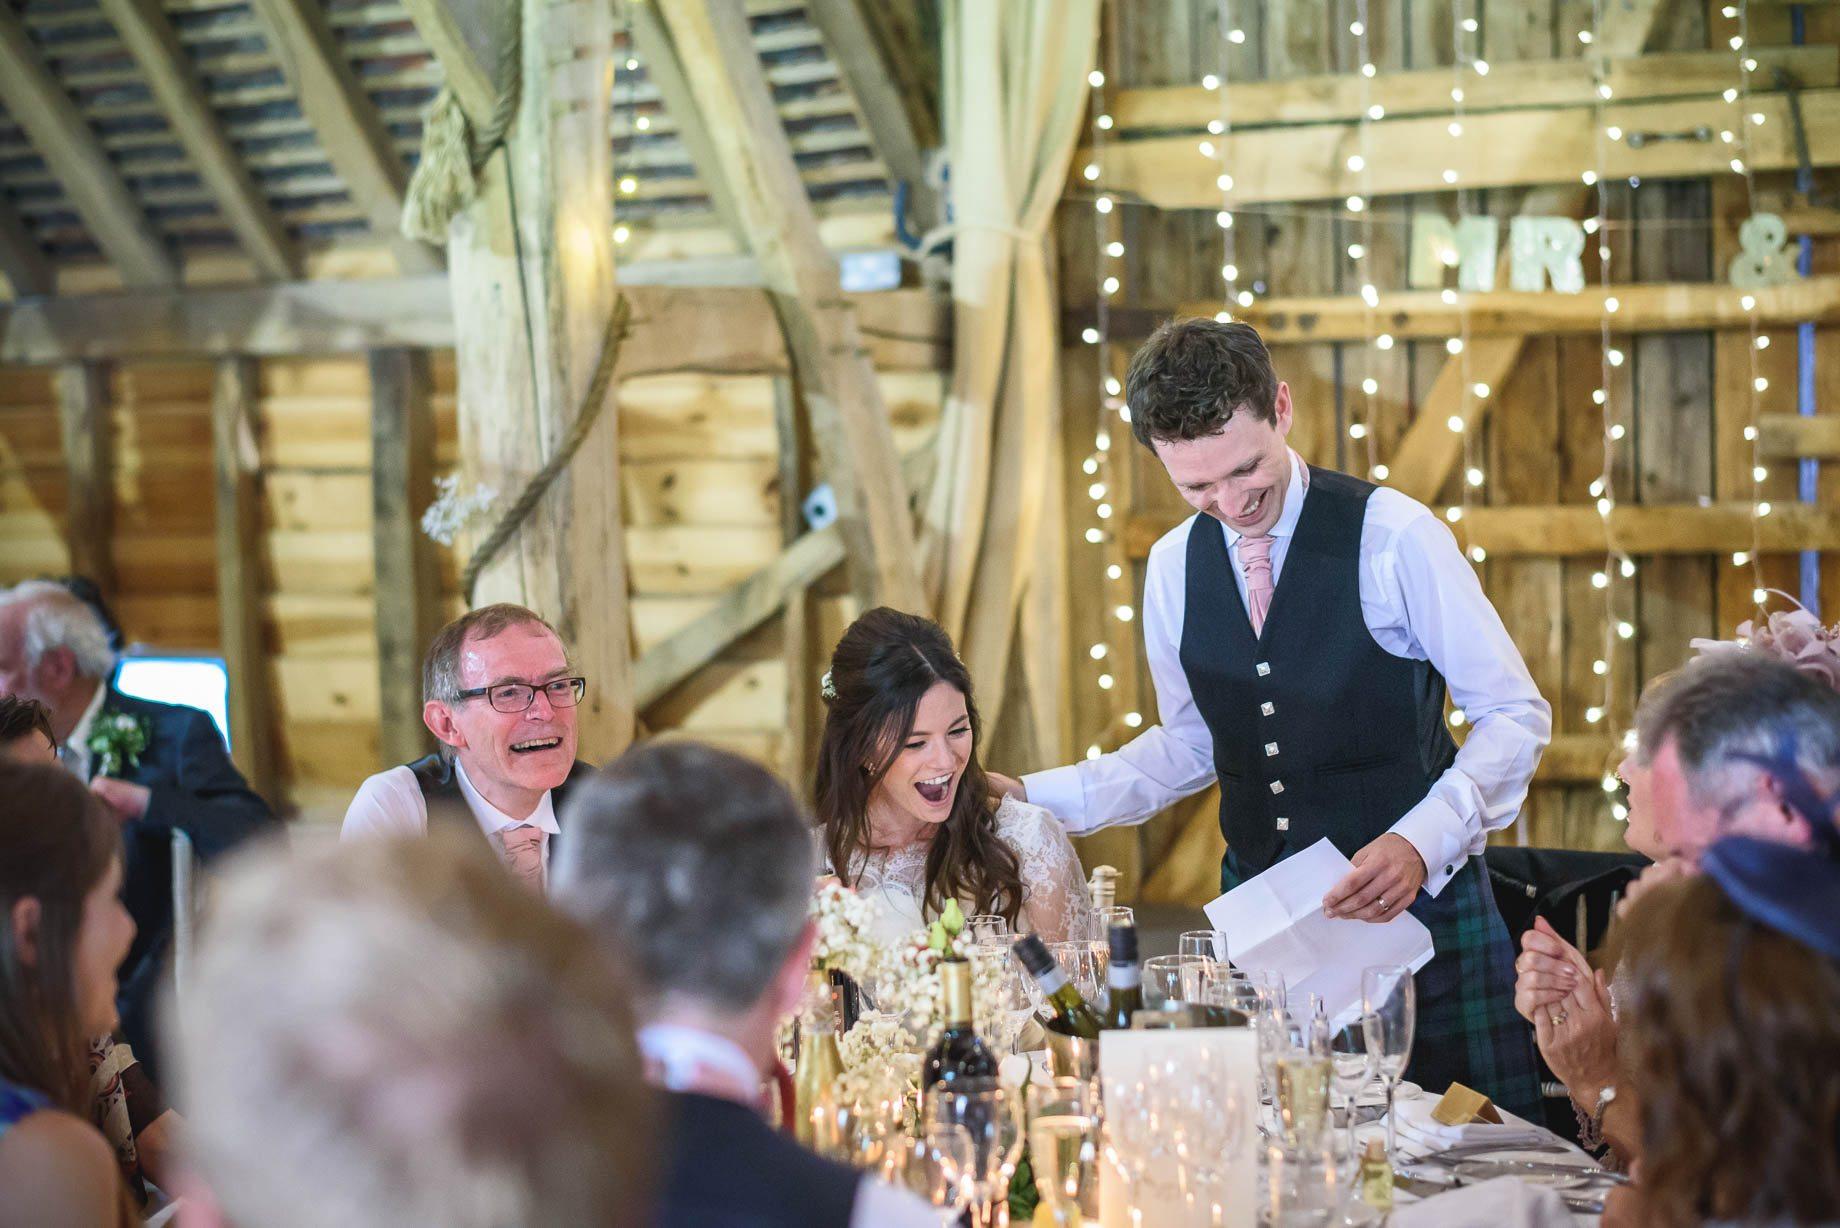 Gildings Barn wedding photography - Sarah and Steve (136 of 190)